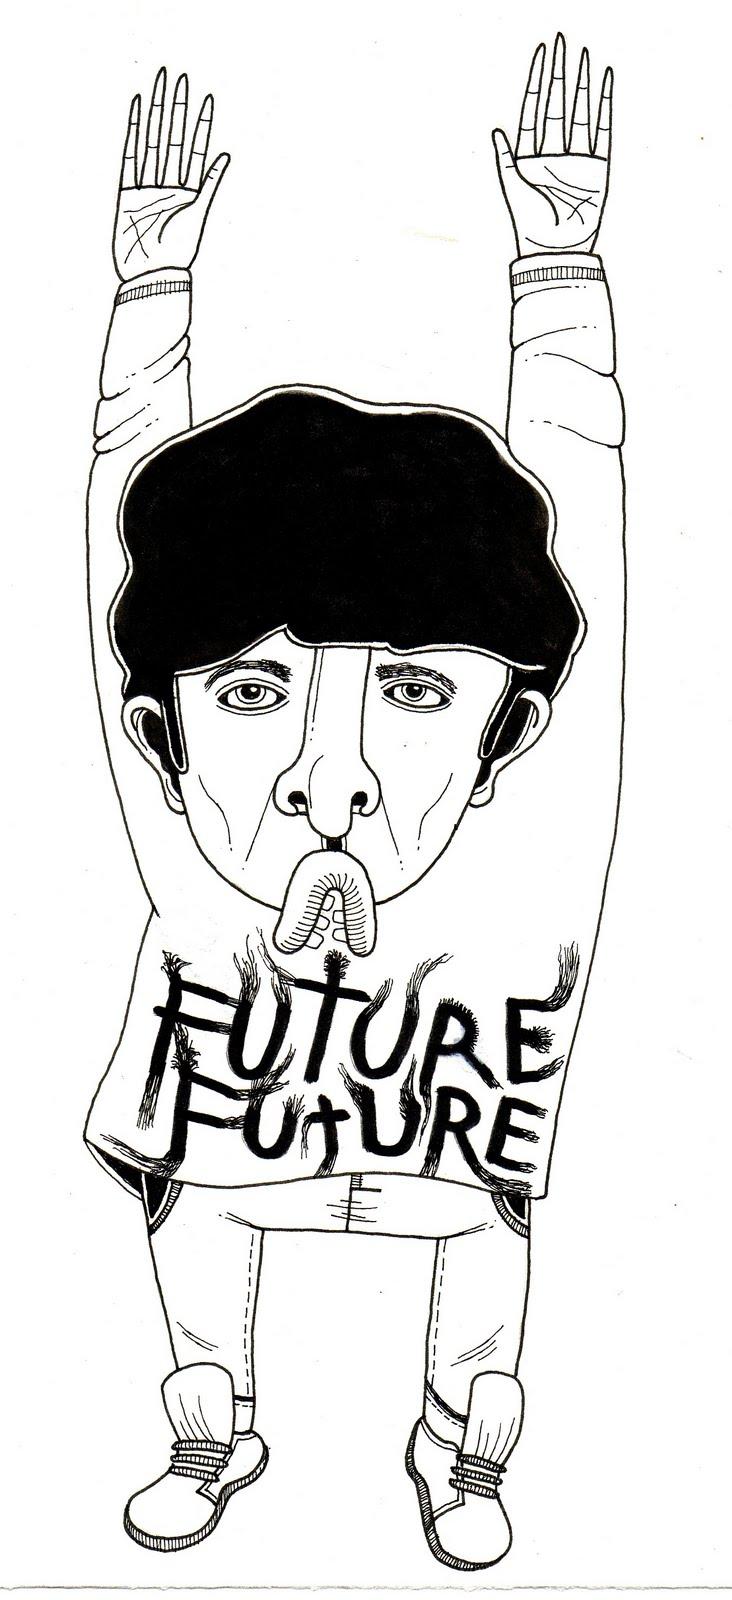 [futurefuture]